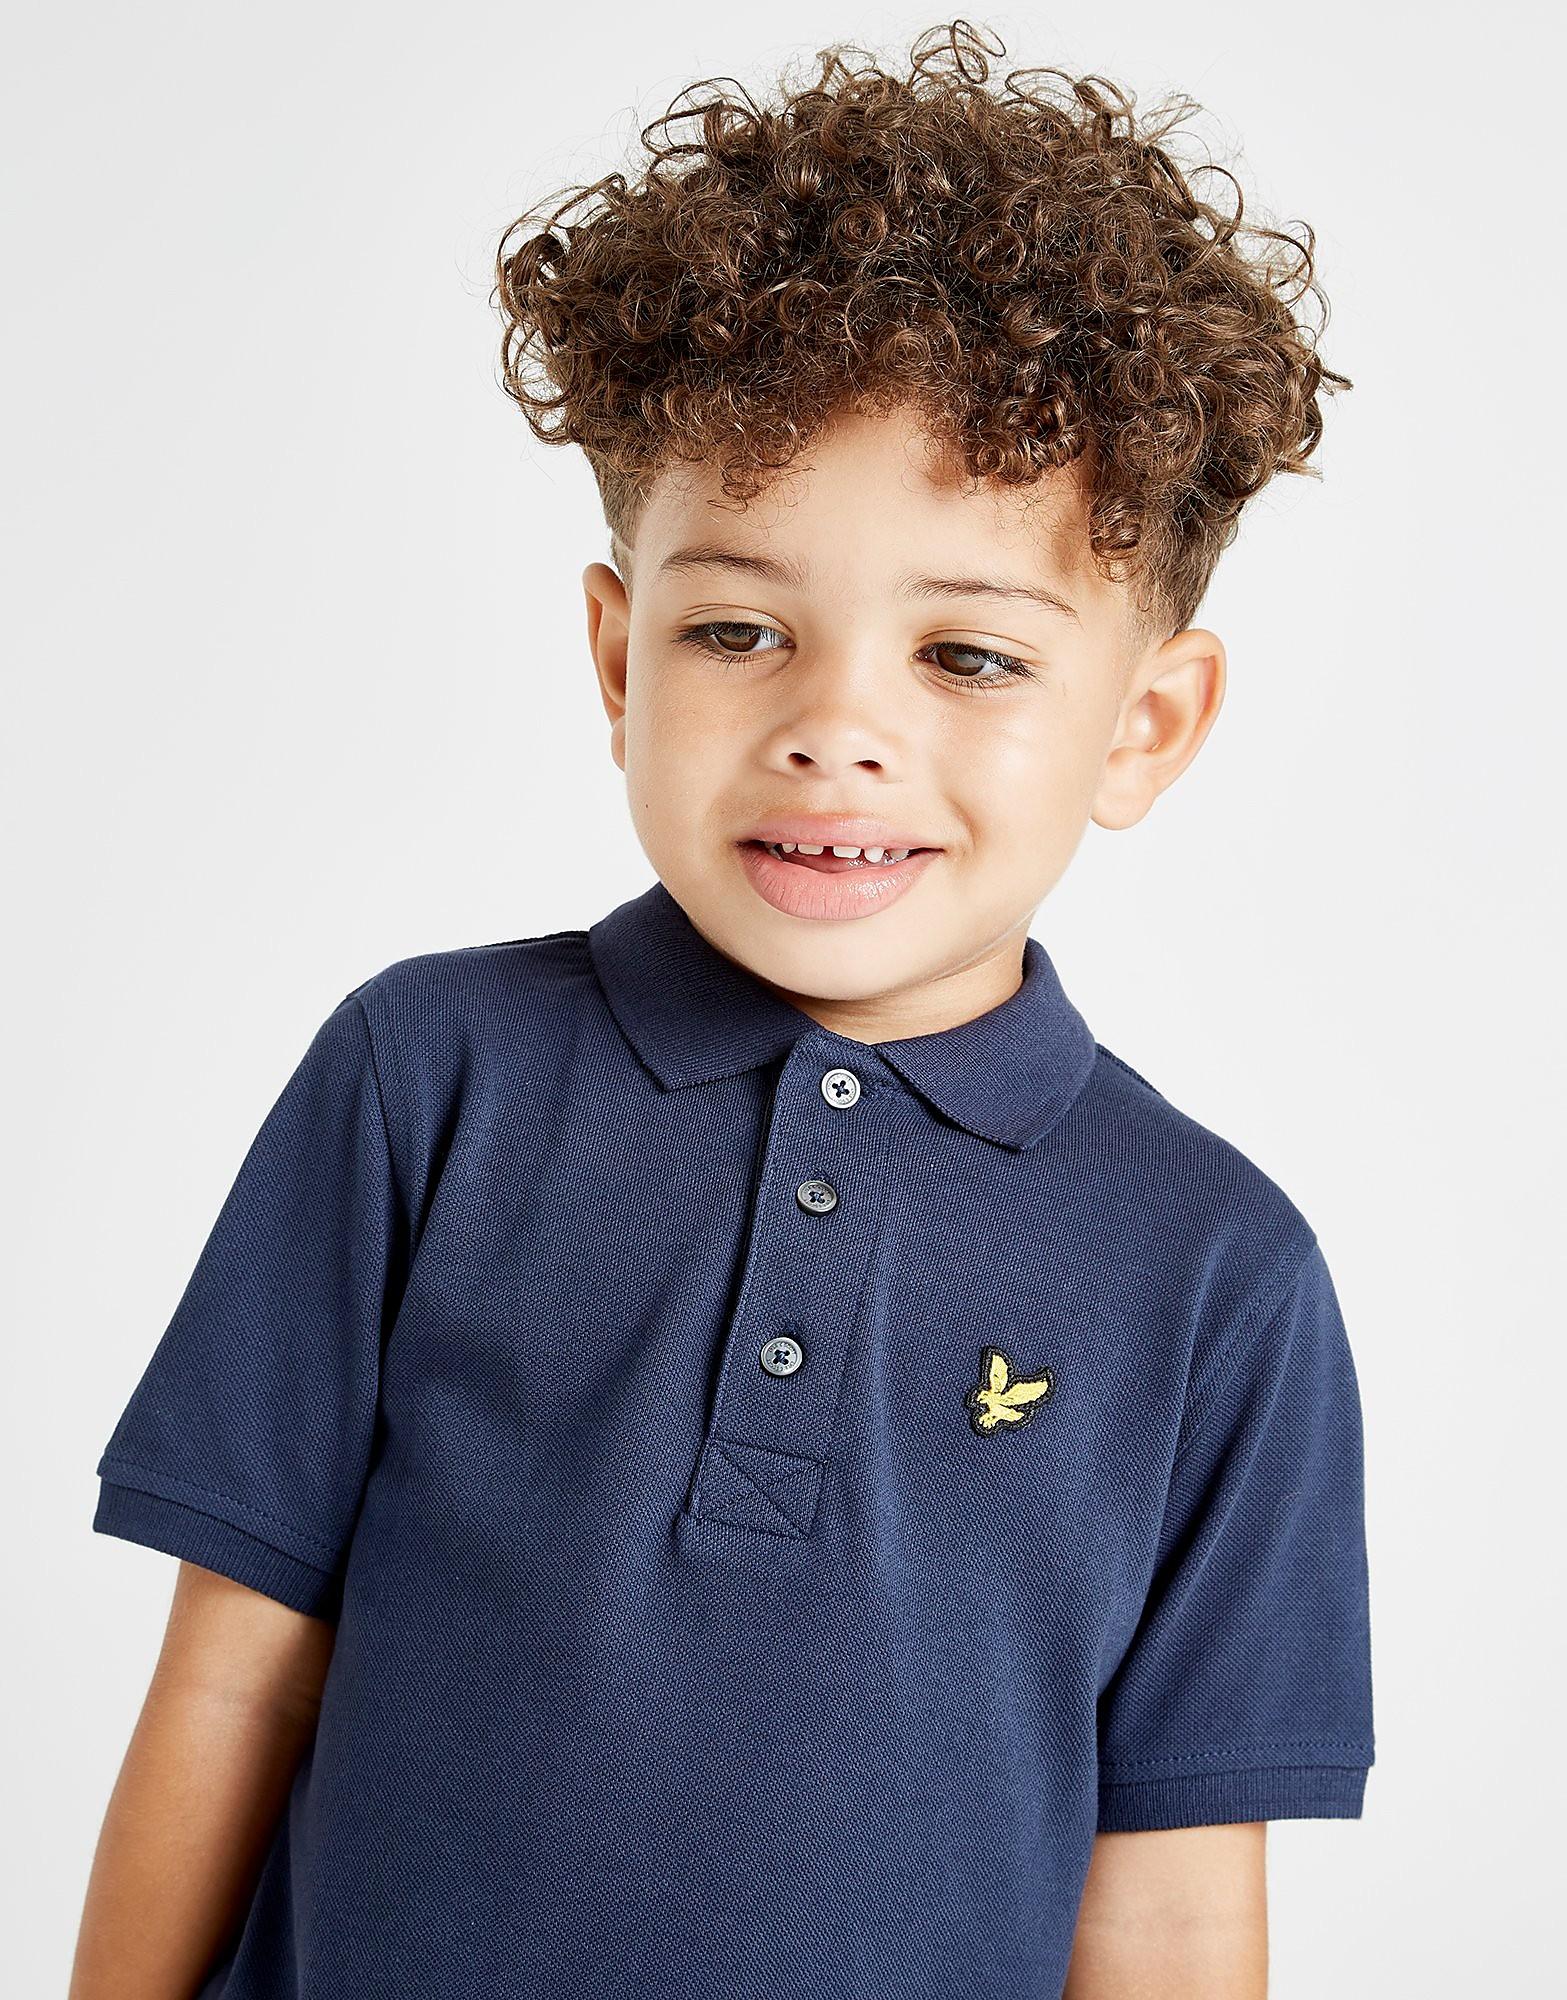 Lyle & Scott Logo Polo Shirt Children - Blauw - Kind